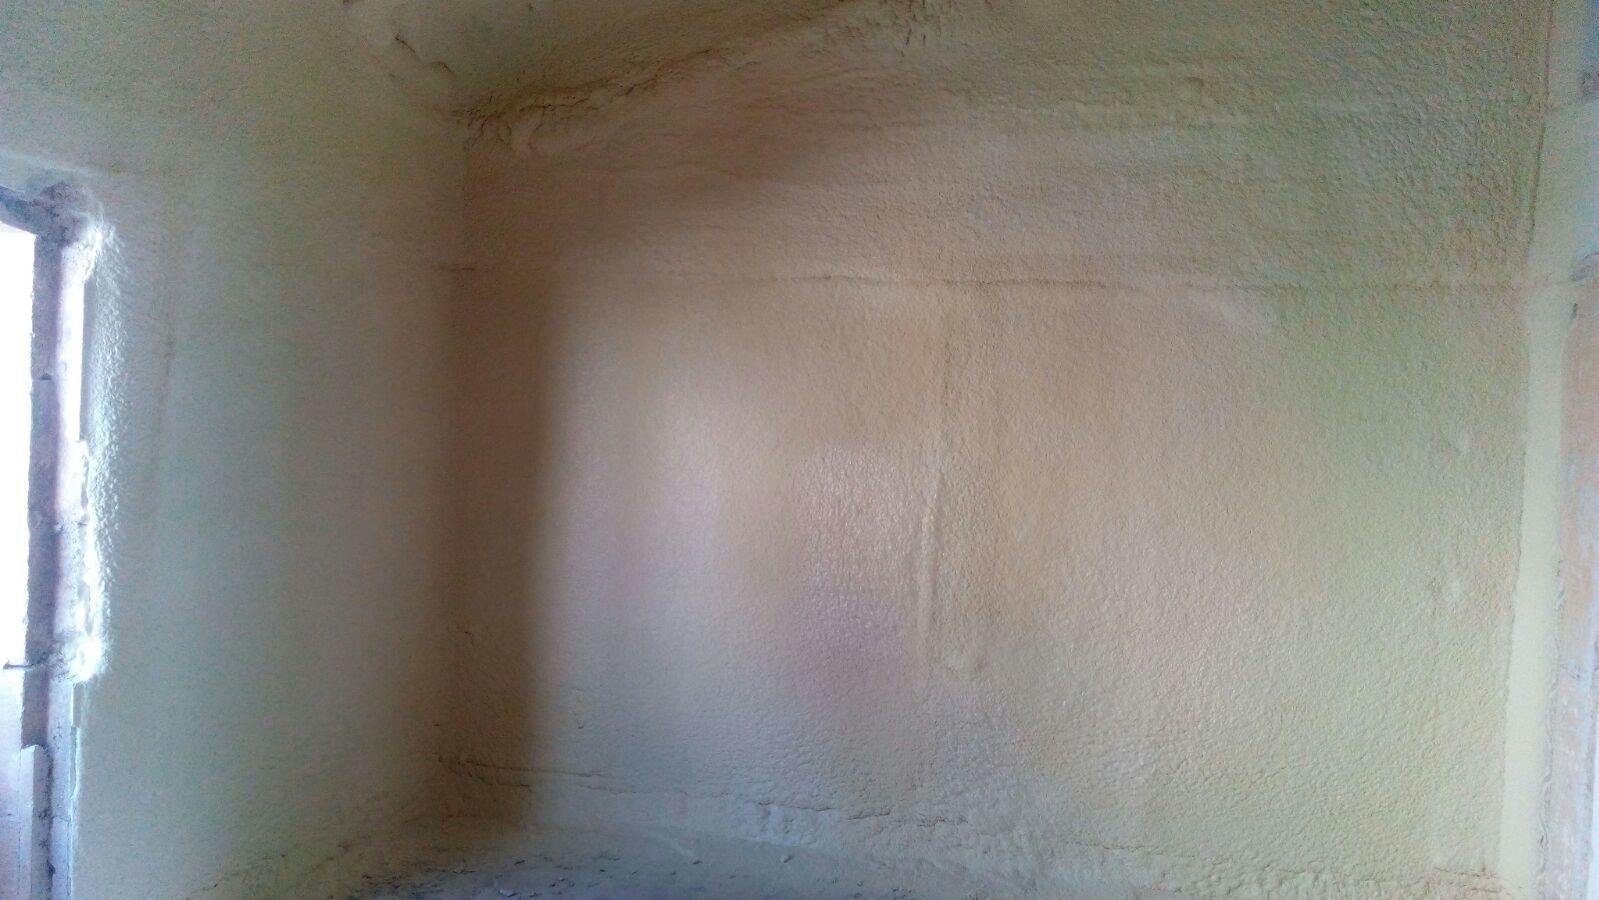 Foto 40 de Aislamientos acústicos y térmicos en Rafelcofer | Aislamientos de Poliuretano Jaime Femenia